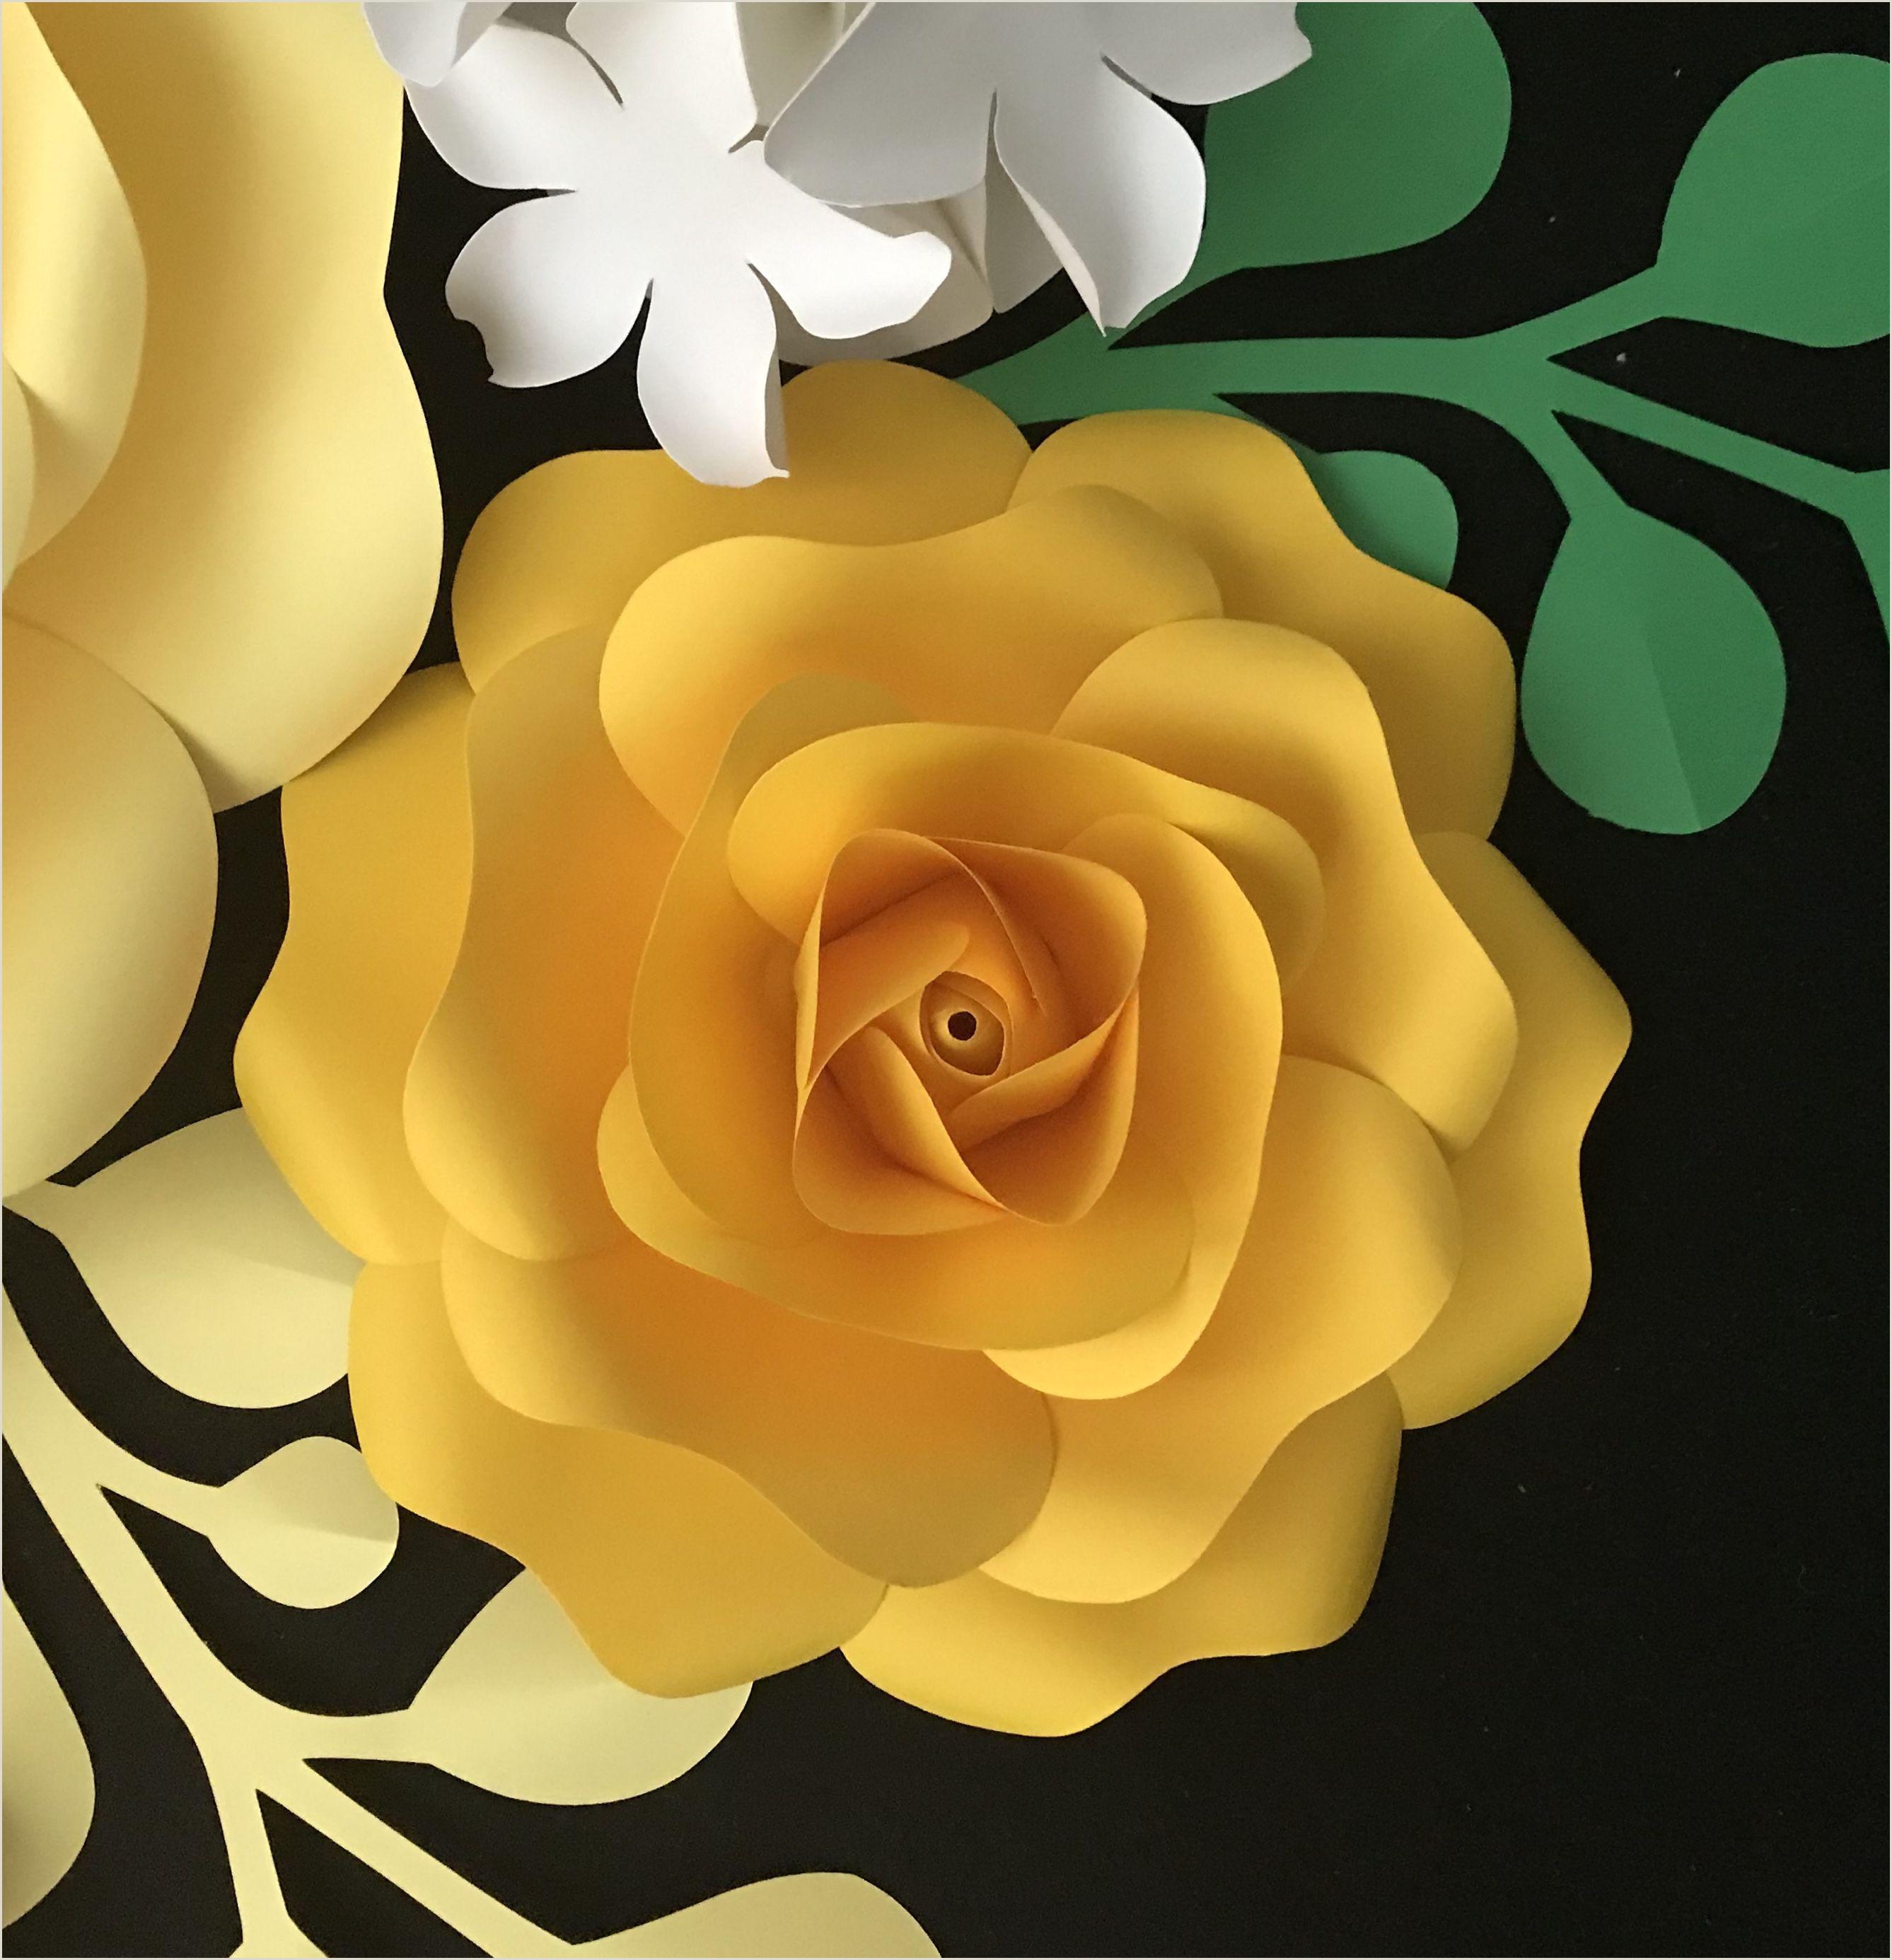 Large Flower Petal Template Paper Rose Template Paper Flower Template Flower Petal